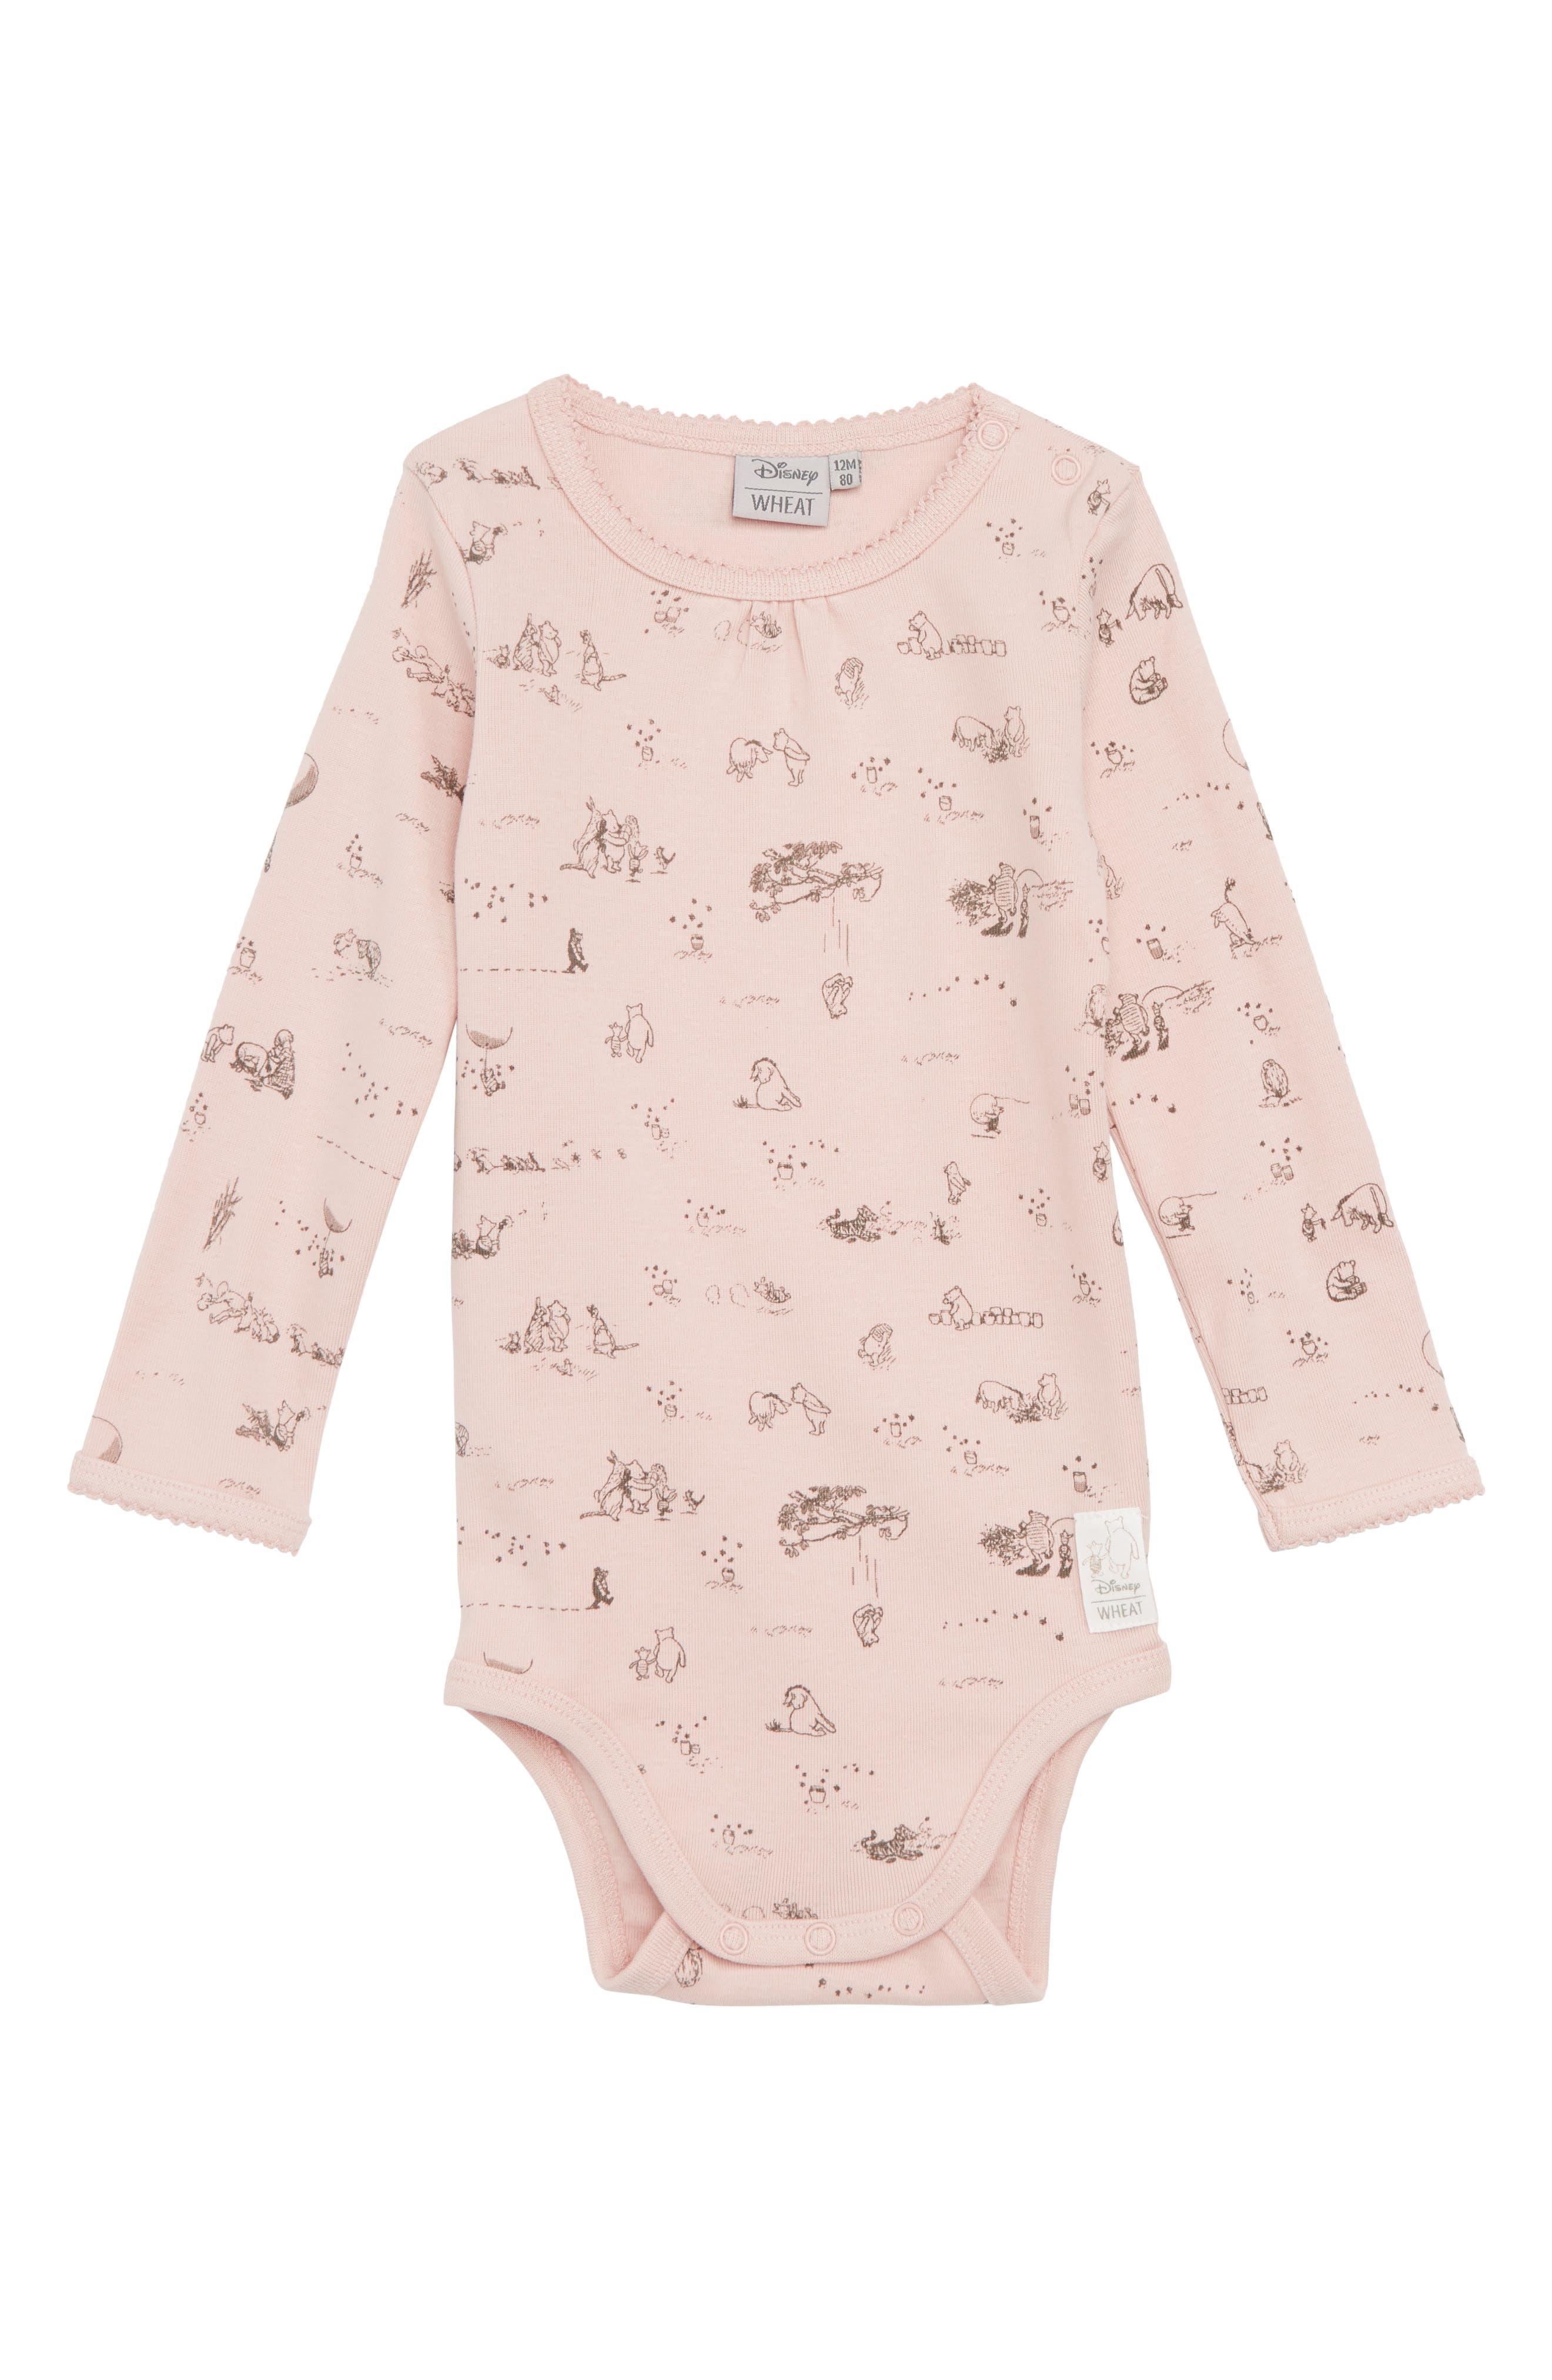 x Disney<sup>®</sup> Winnie the Pooh Organic Cotton Bodysuit,                             Main thumbnail 1, color,                             653